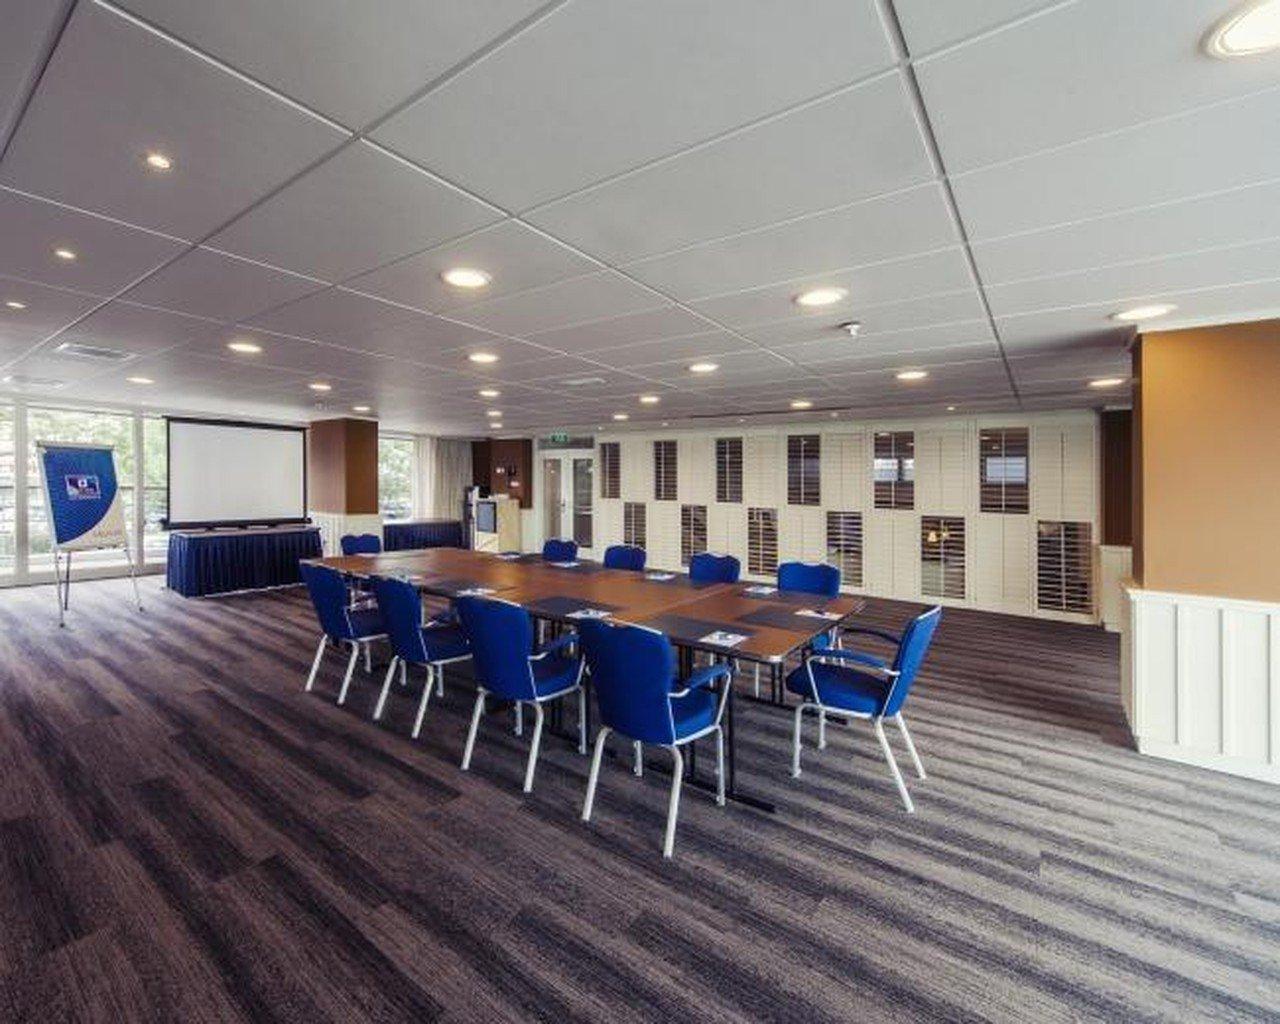 Rotterdam conference rooms Salle de réunion Delta Hotel - Aquarius image 1